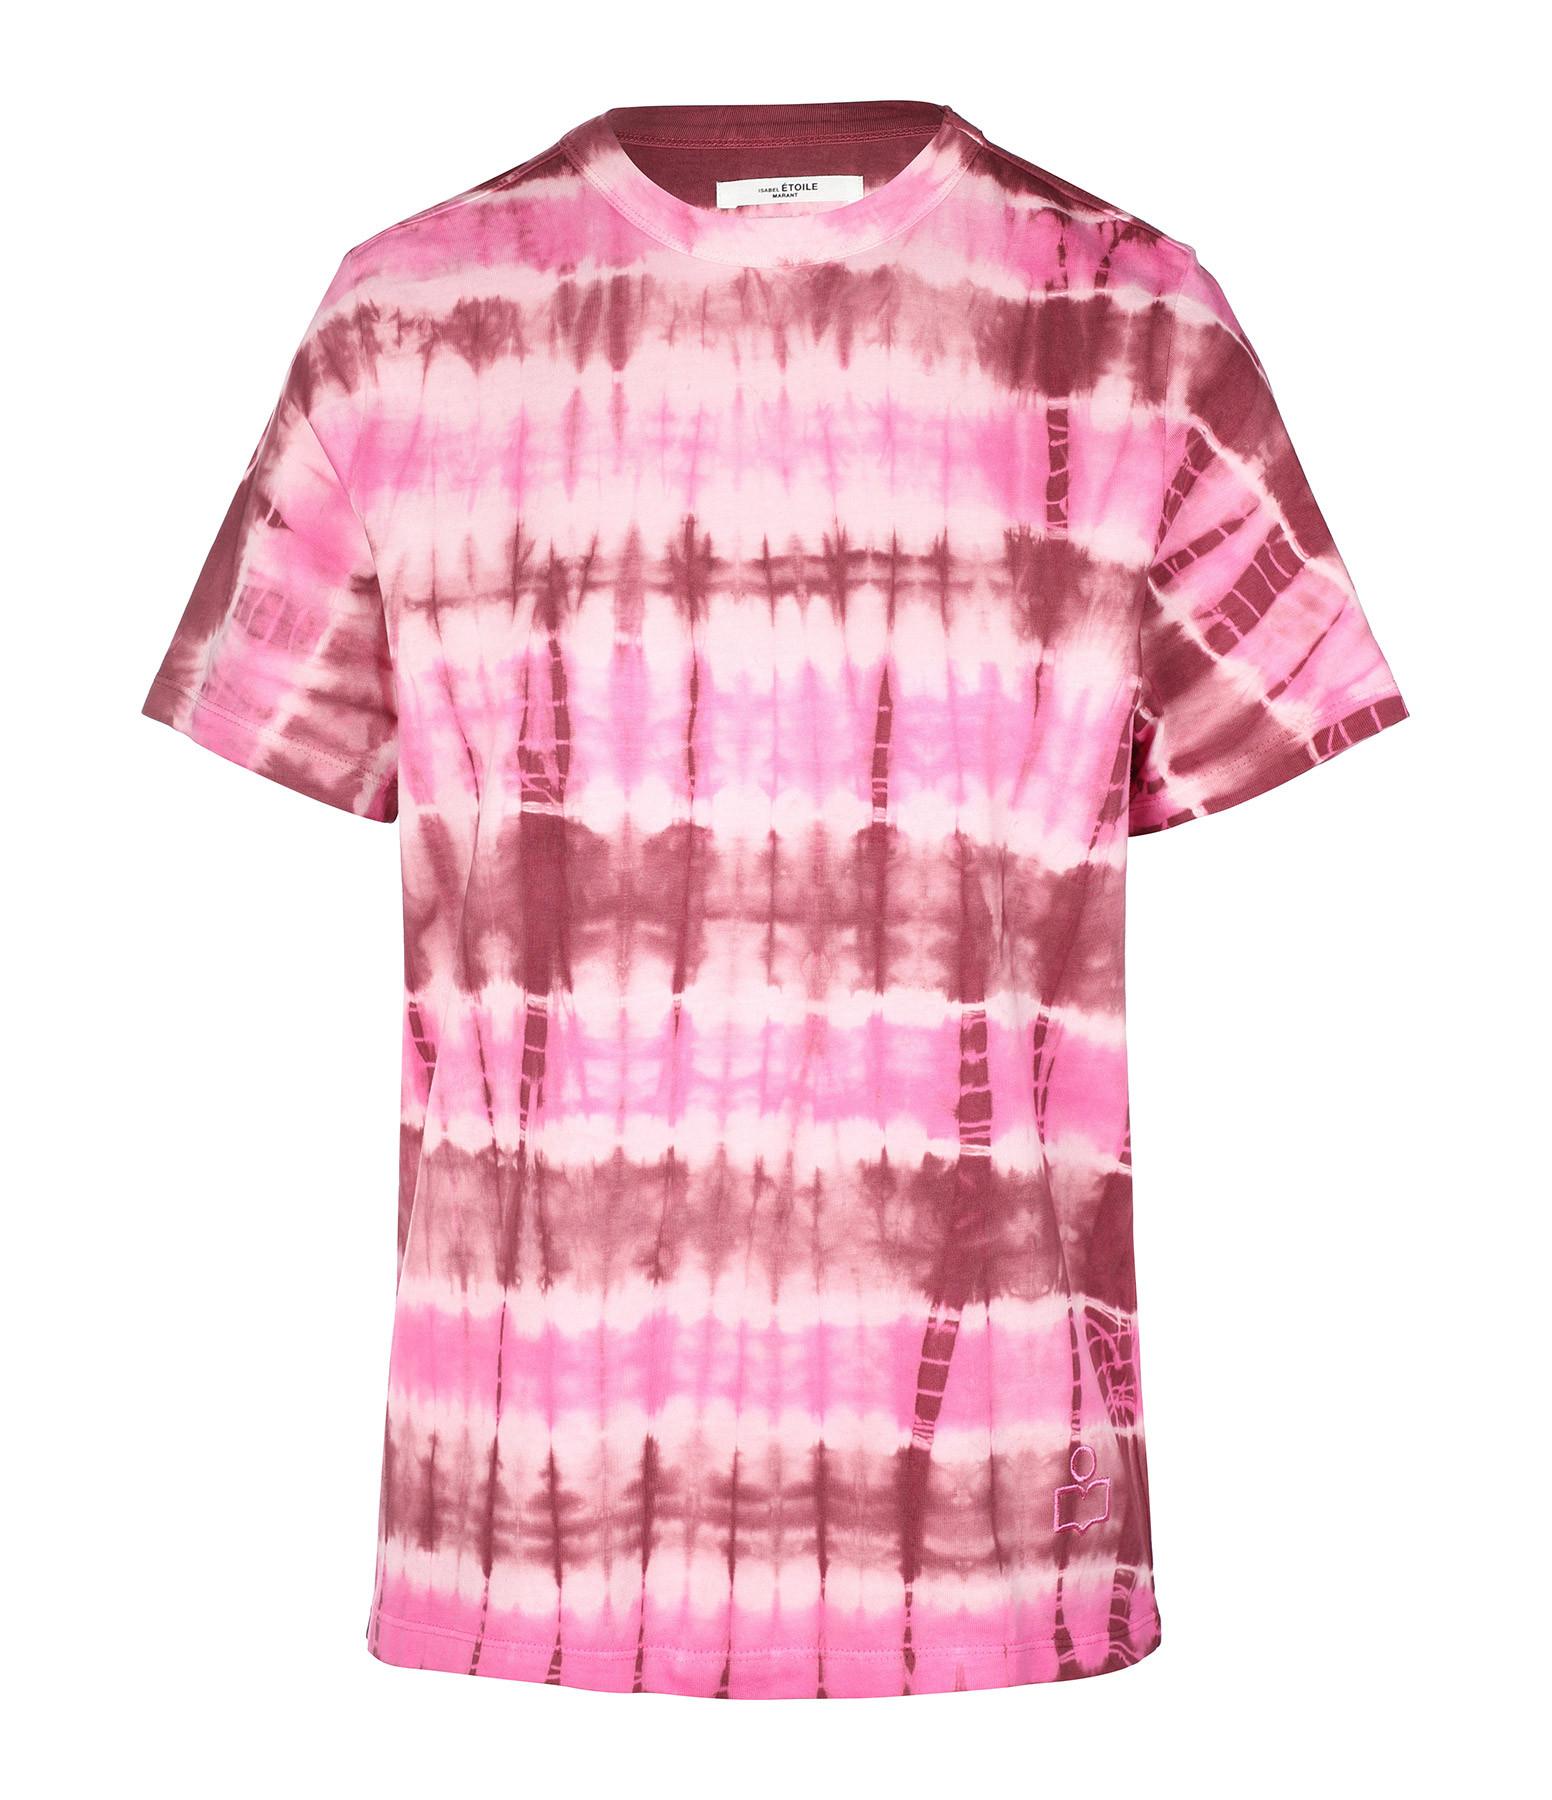 ISABEL MARANT ÉTOILE - Tee-shirt Dena Coton Bordeaux